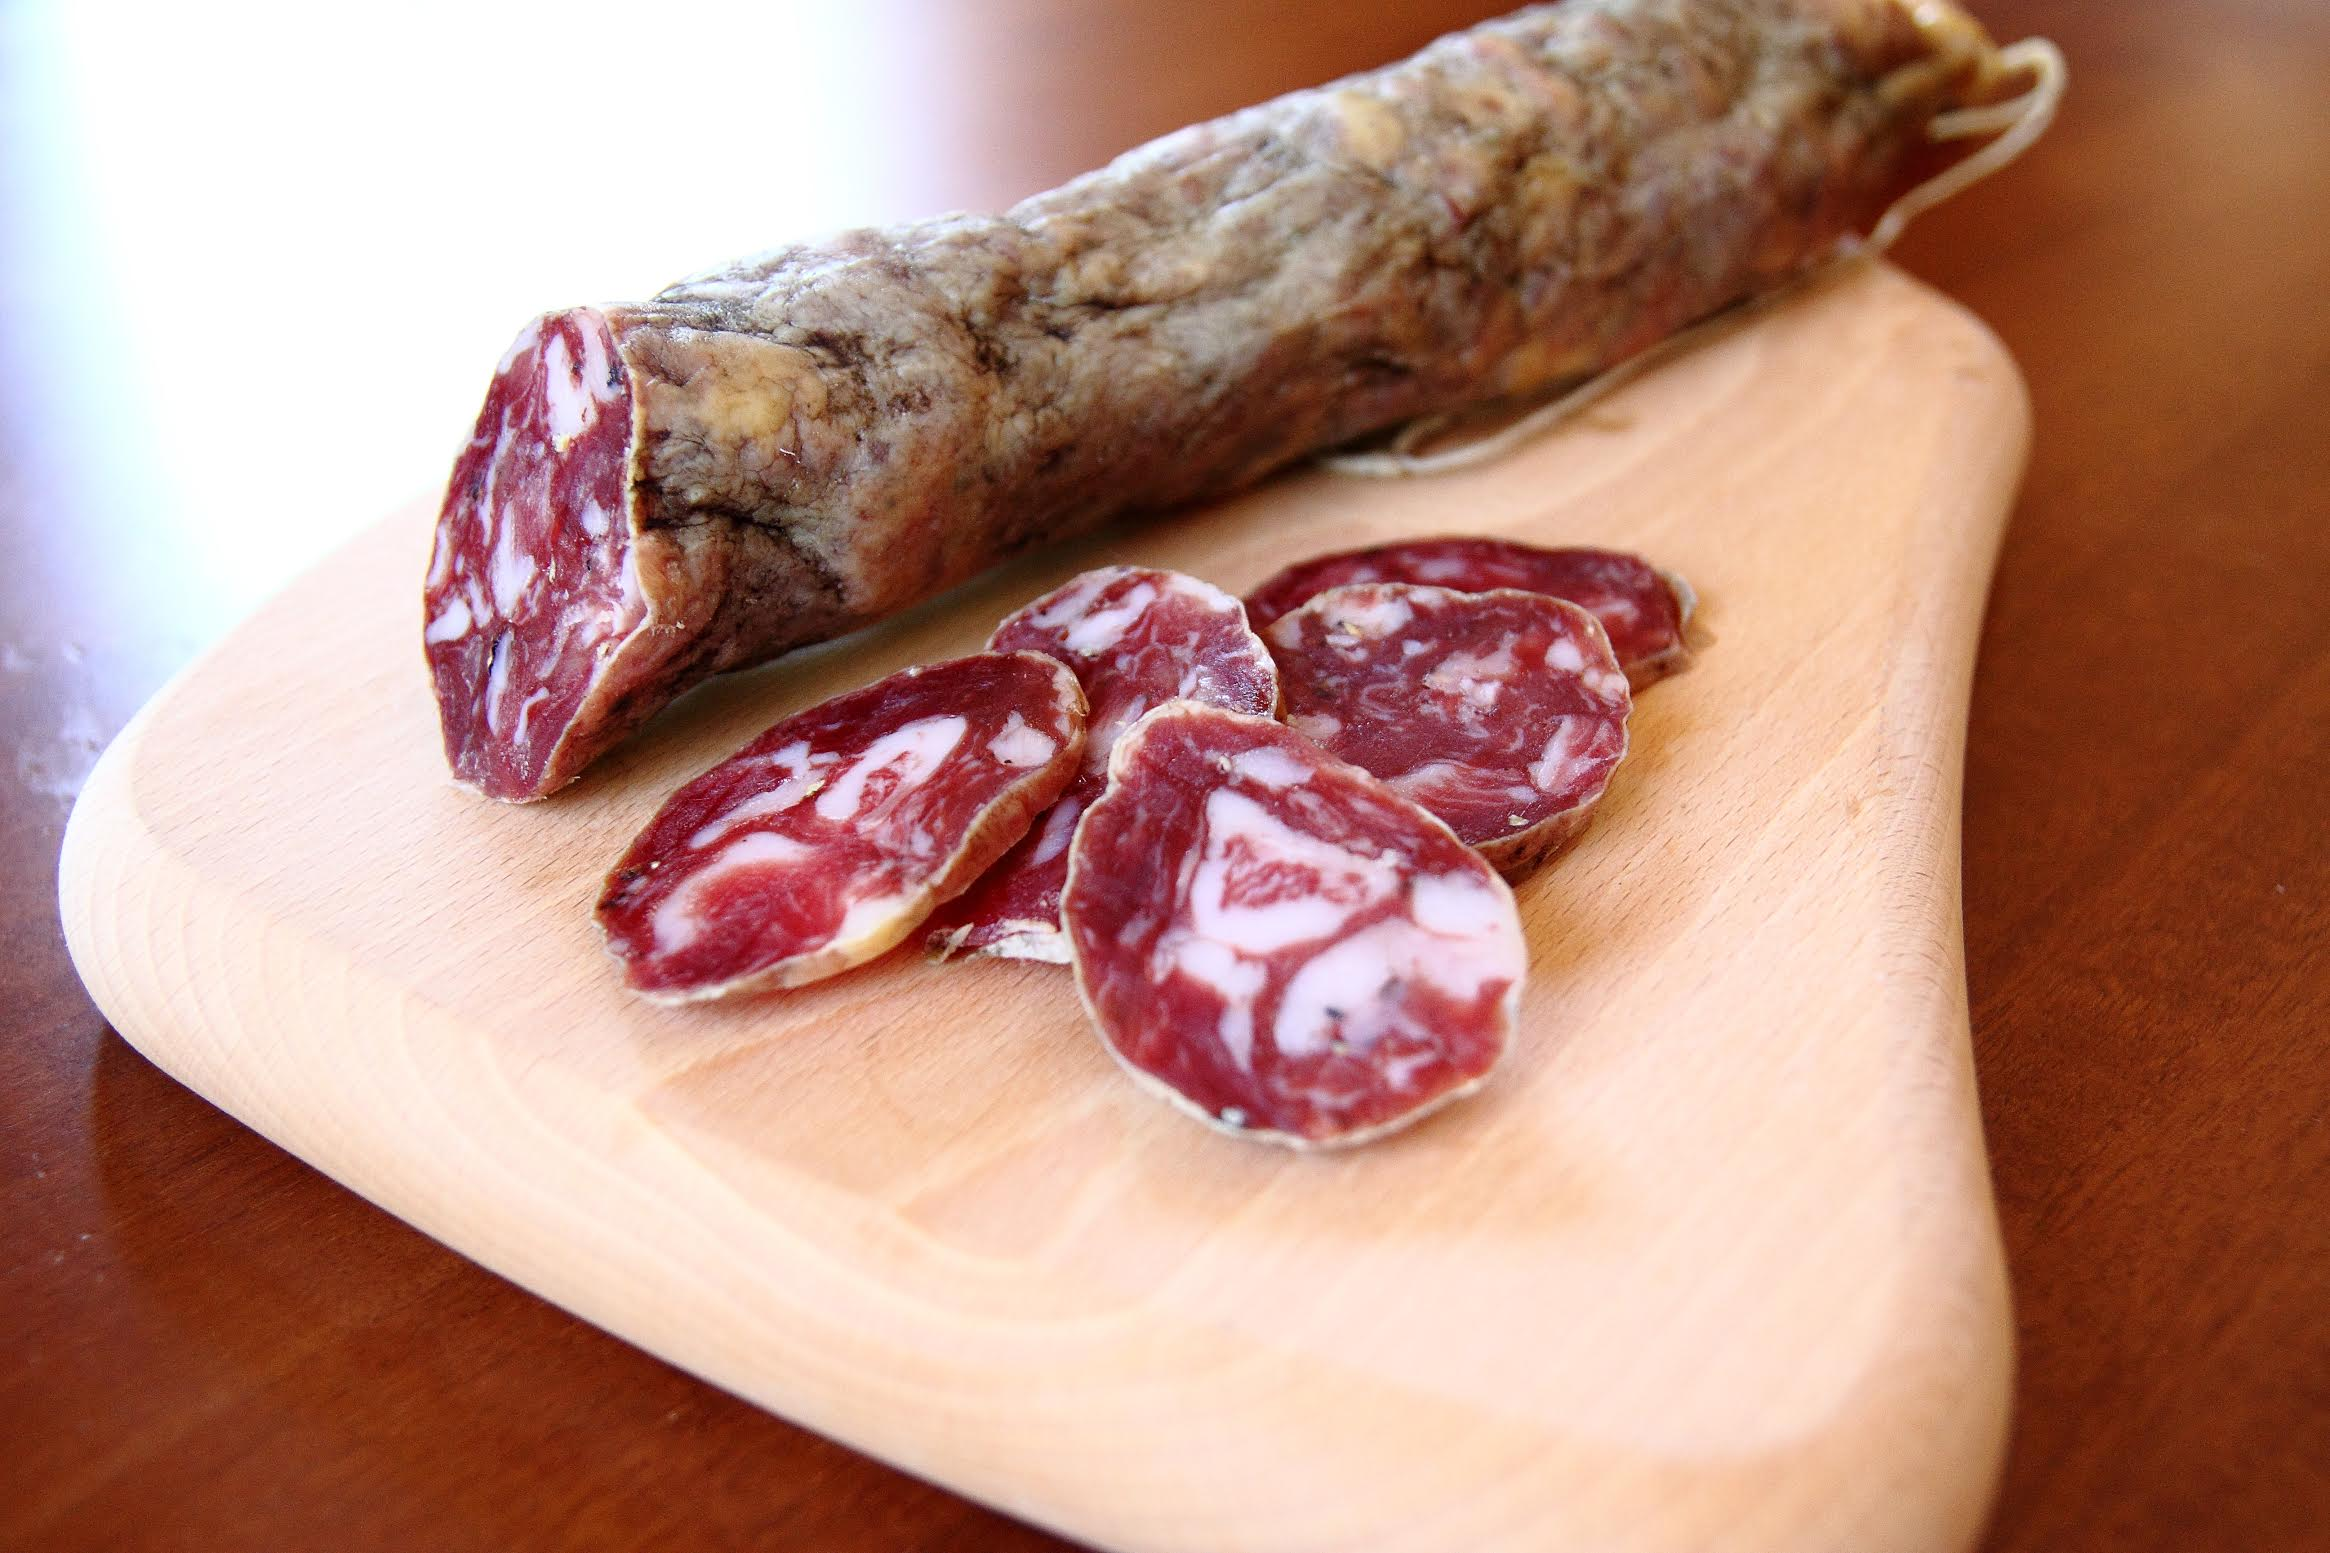 Salame di suino nero dei Nebrodi (Salami vom schwarzen Schwein aus Nebrodi) - Ponte due Archi